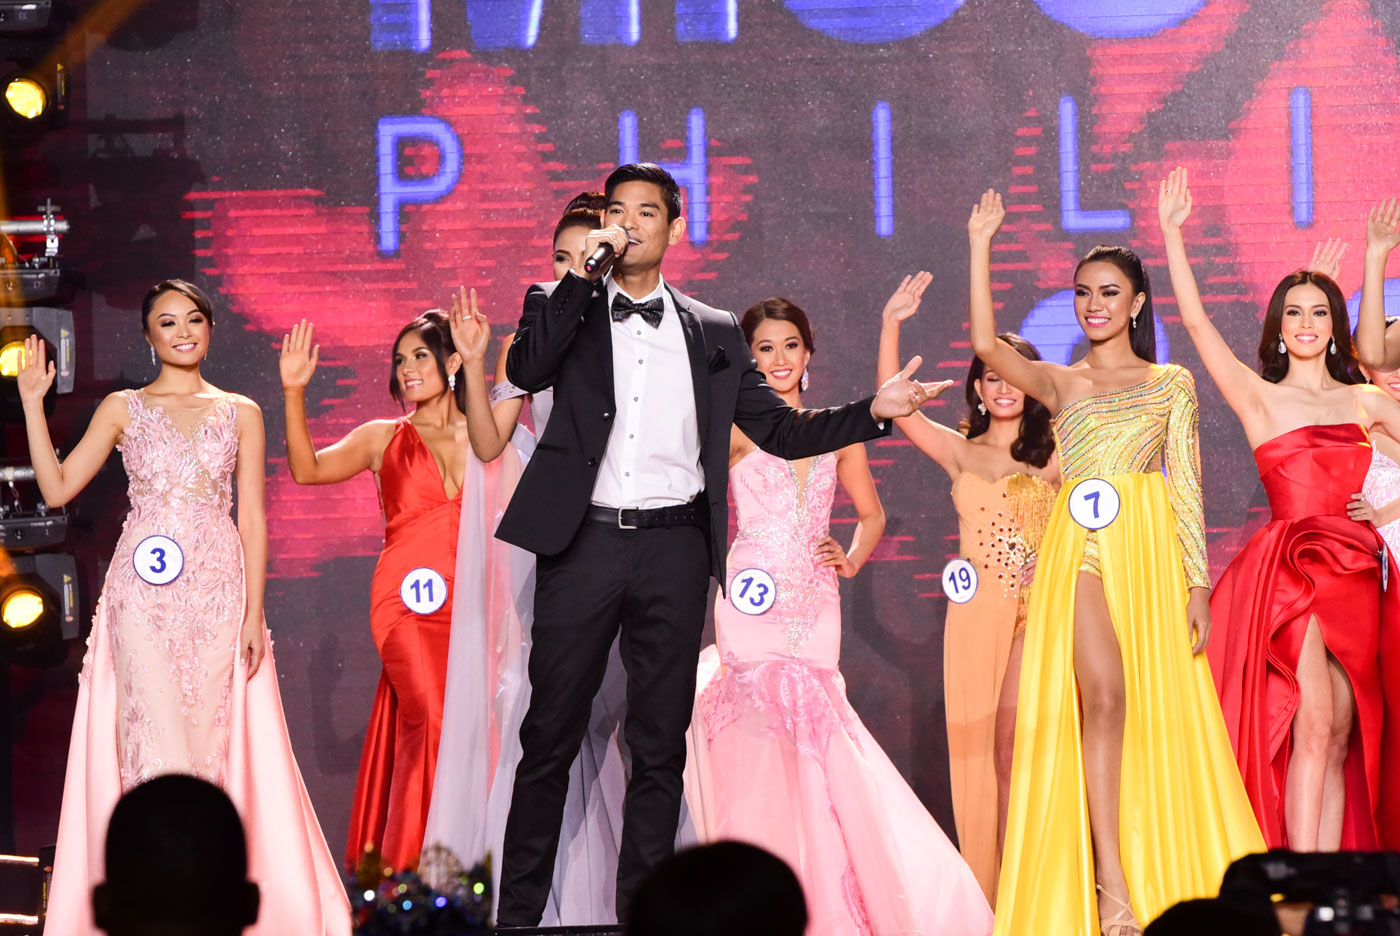 Jay R performs while contestants #3 Glyssa Leian Perez, #11 Gabriela Ortega, #13 Kathryn Cudiamat, #19 Joanna Marie Rabe, #7 Jane Darren Genobisa walk the stage.